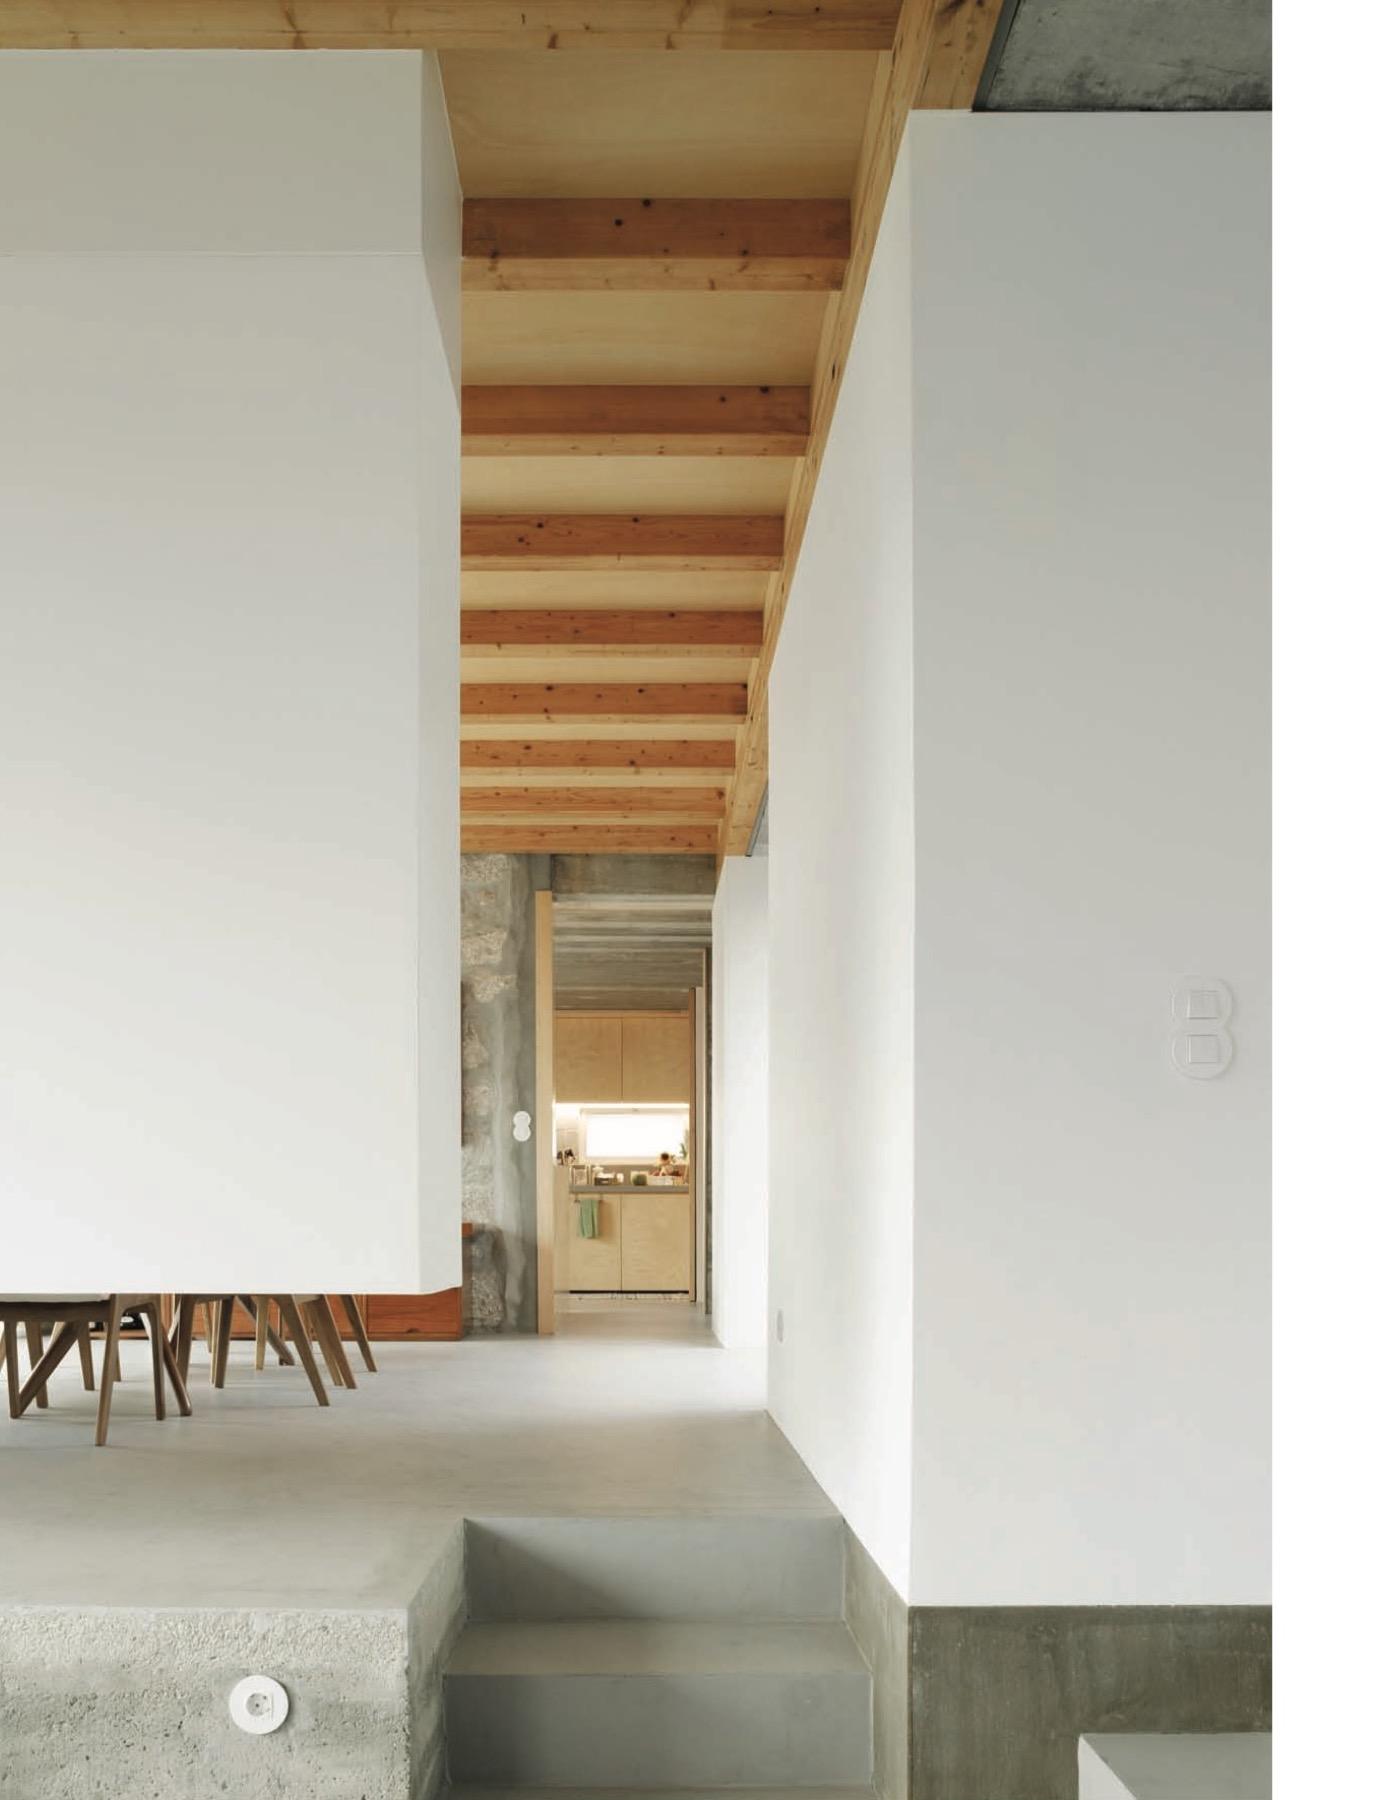 INTERIORS KOREA 414 casa rio paulo merlini ivo tavares studio 11 12